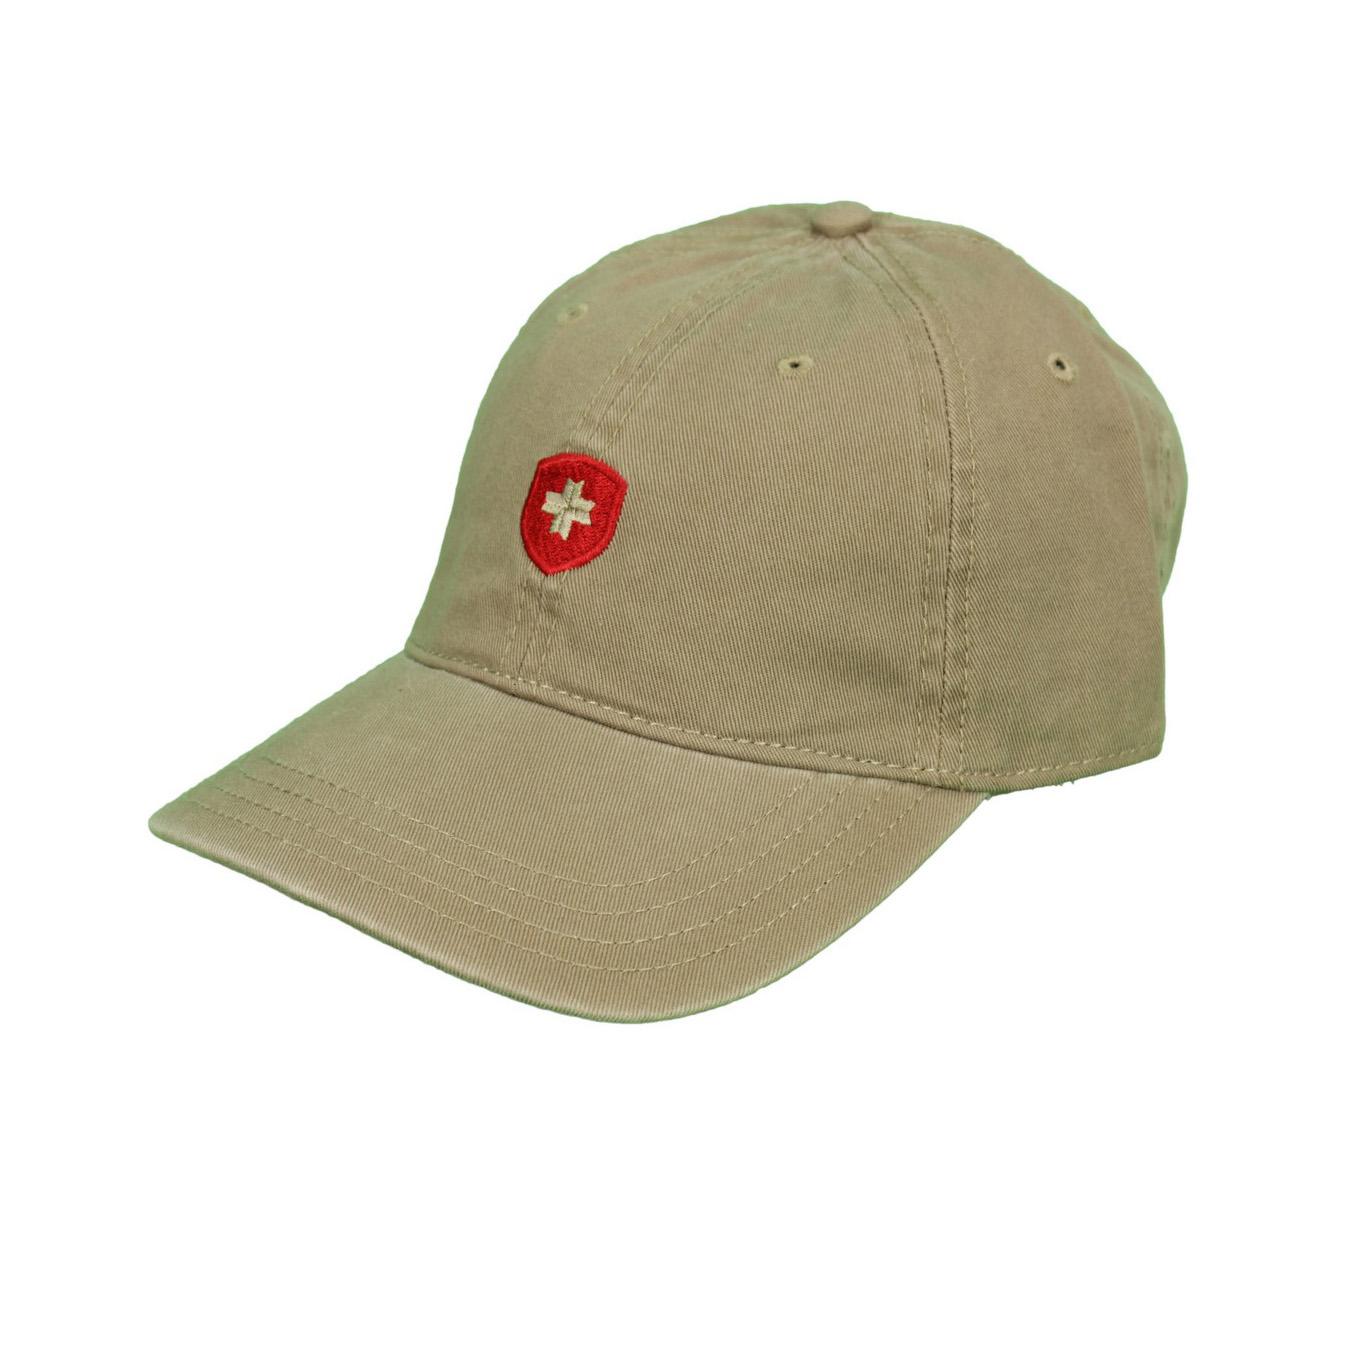 Wellensteyn Baseball Cap Kappe Olive grün PBSC 198 Olive